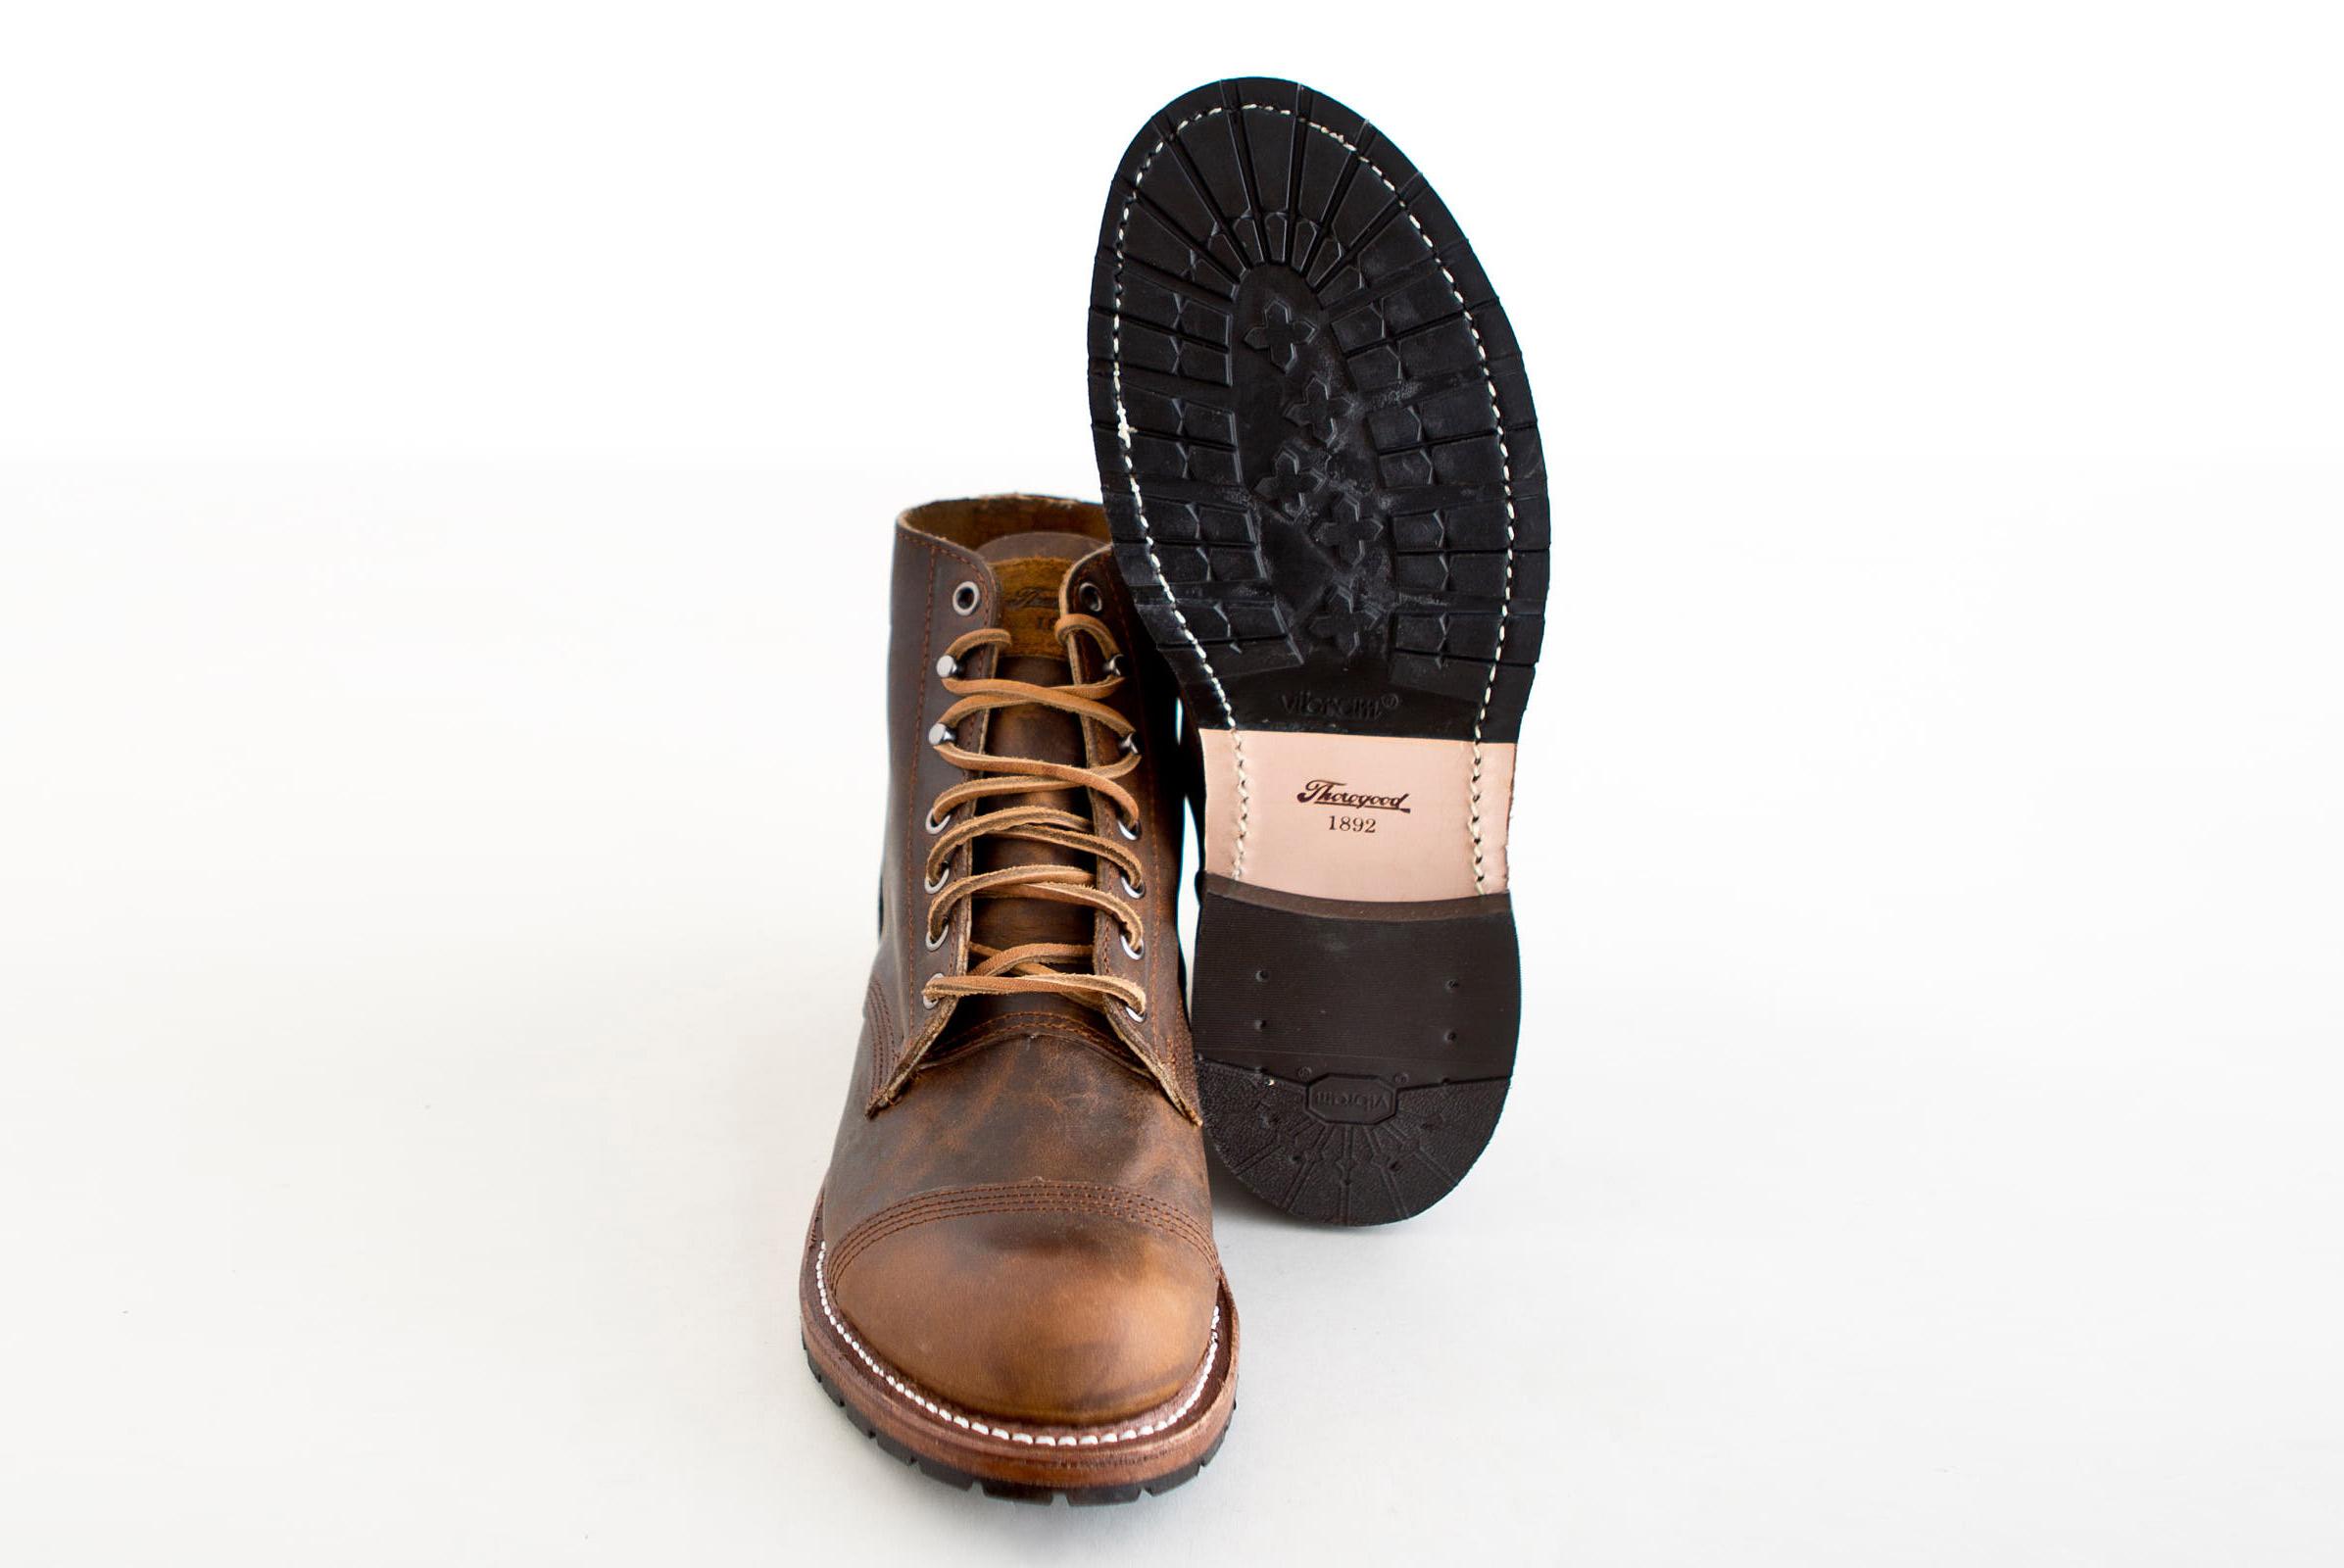 Thorogood-Dodgeville-Wheat-Predator-Boots-03